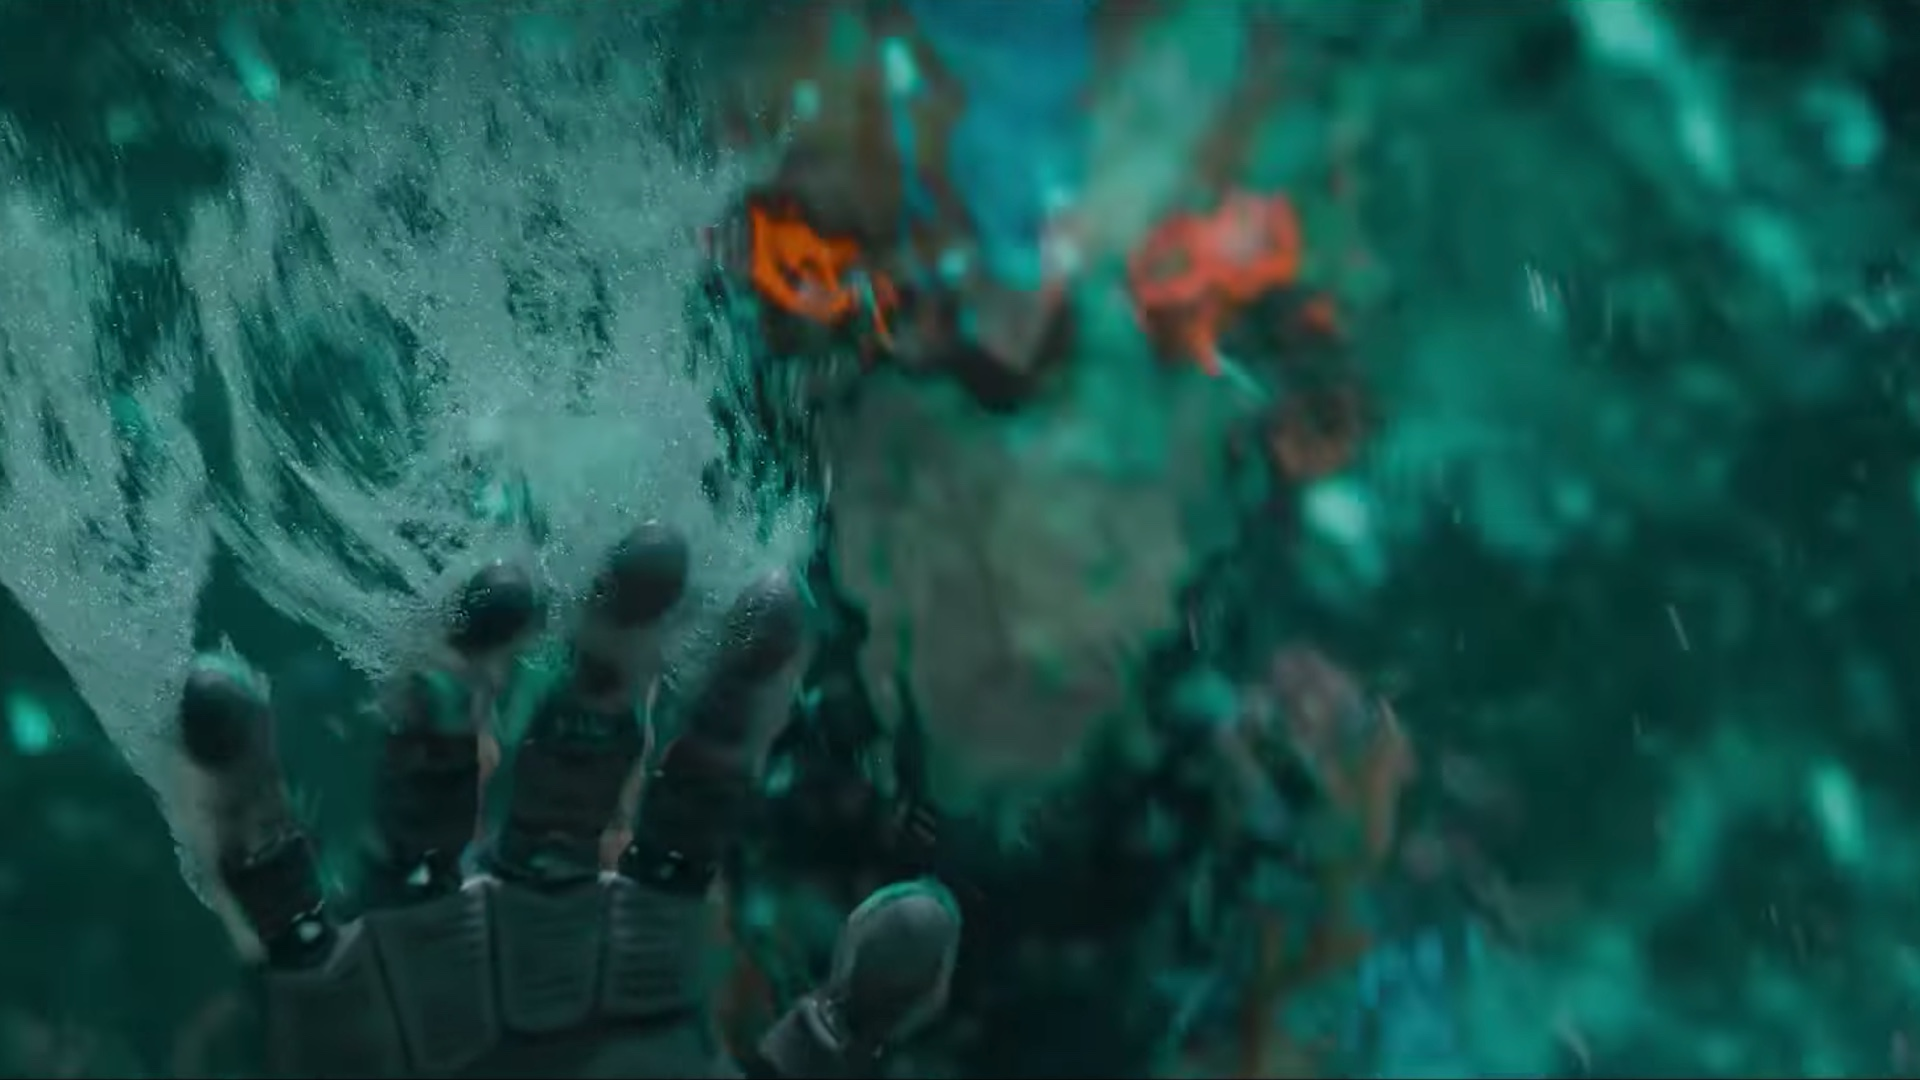 stunning-teaser-trailer-for-neill-blomkamps-new-sci-fi-short-film-conviction-an-anthem-story-social.jpg